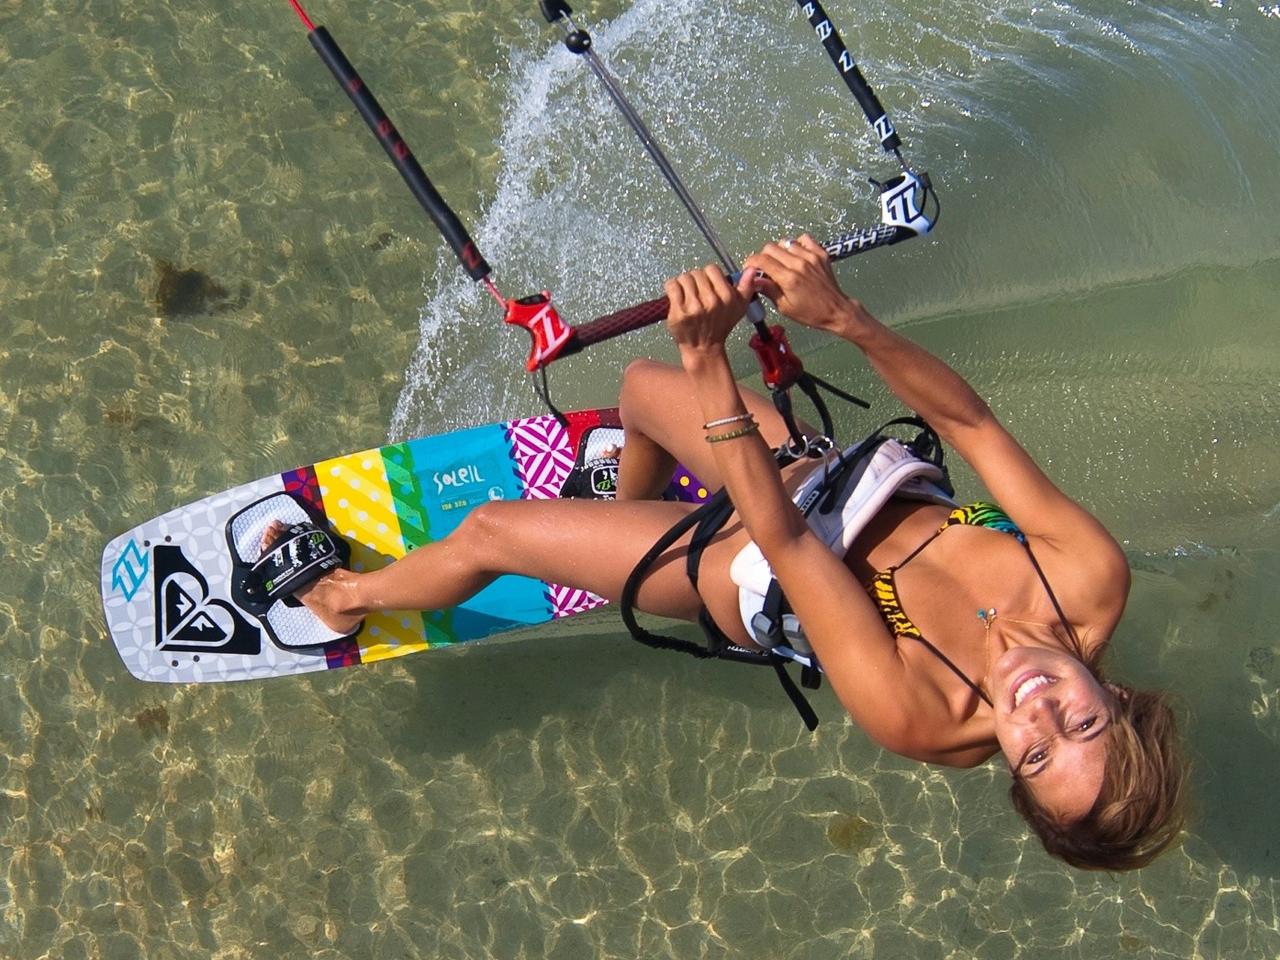 kitesurf wallpaper image - Angela Peral leaning back for the camera - kitesurfing - in resolution: Standard 4:3 1280 X 960